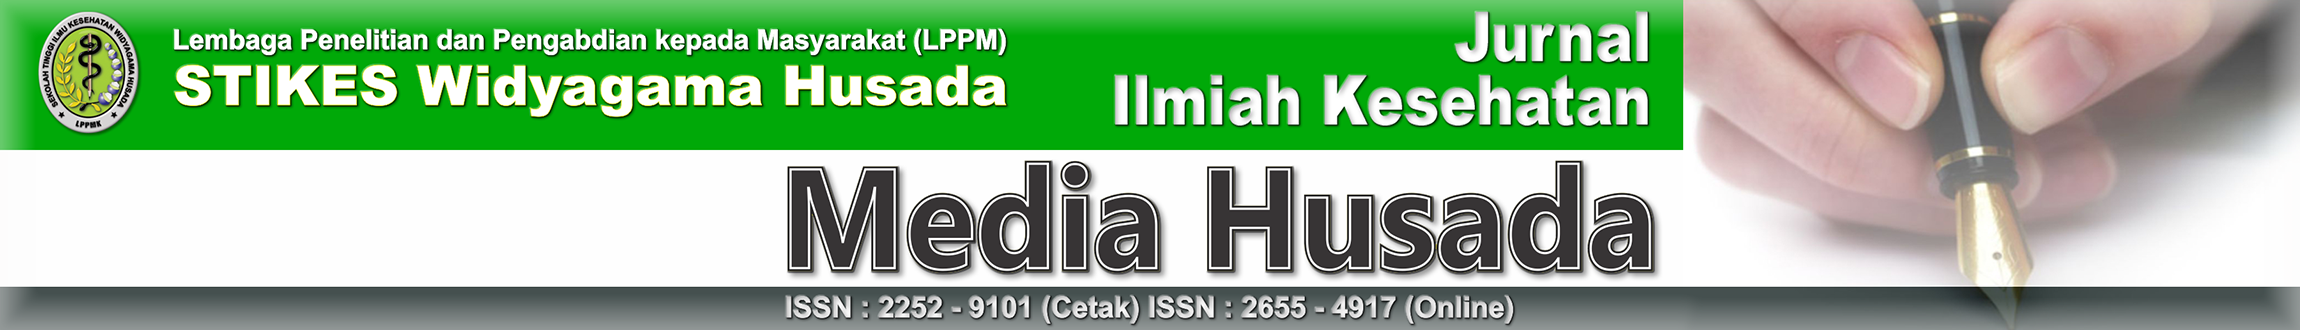 Jurnal Ilmiah Kesehatan Media Husada